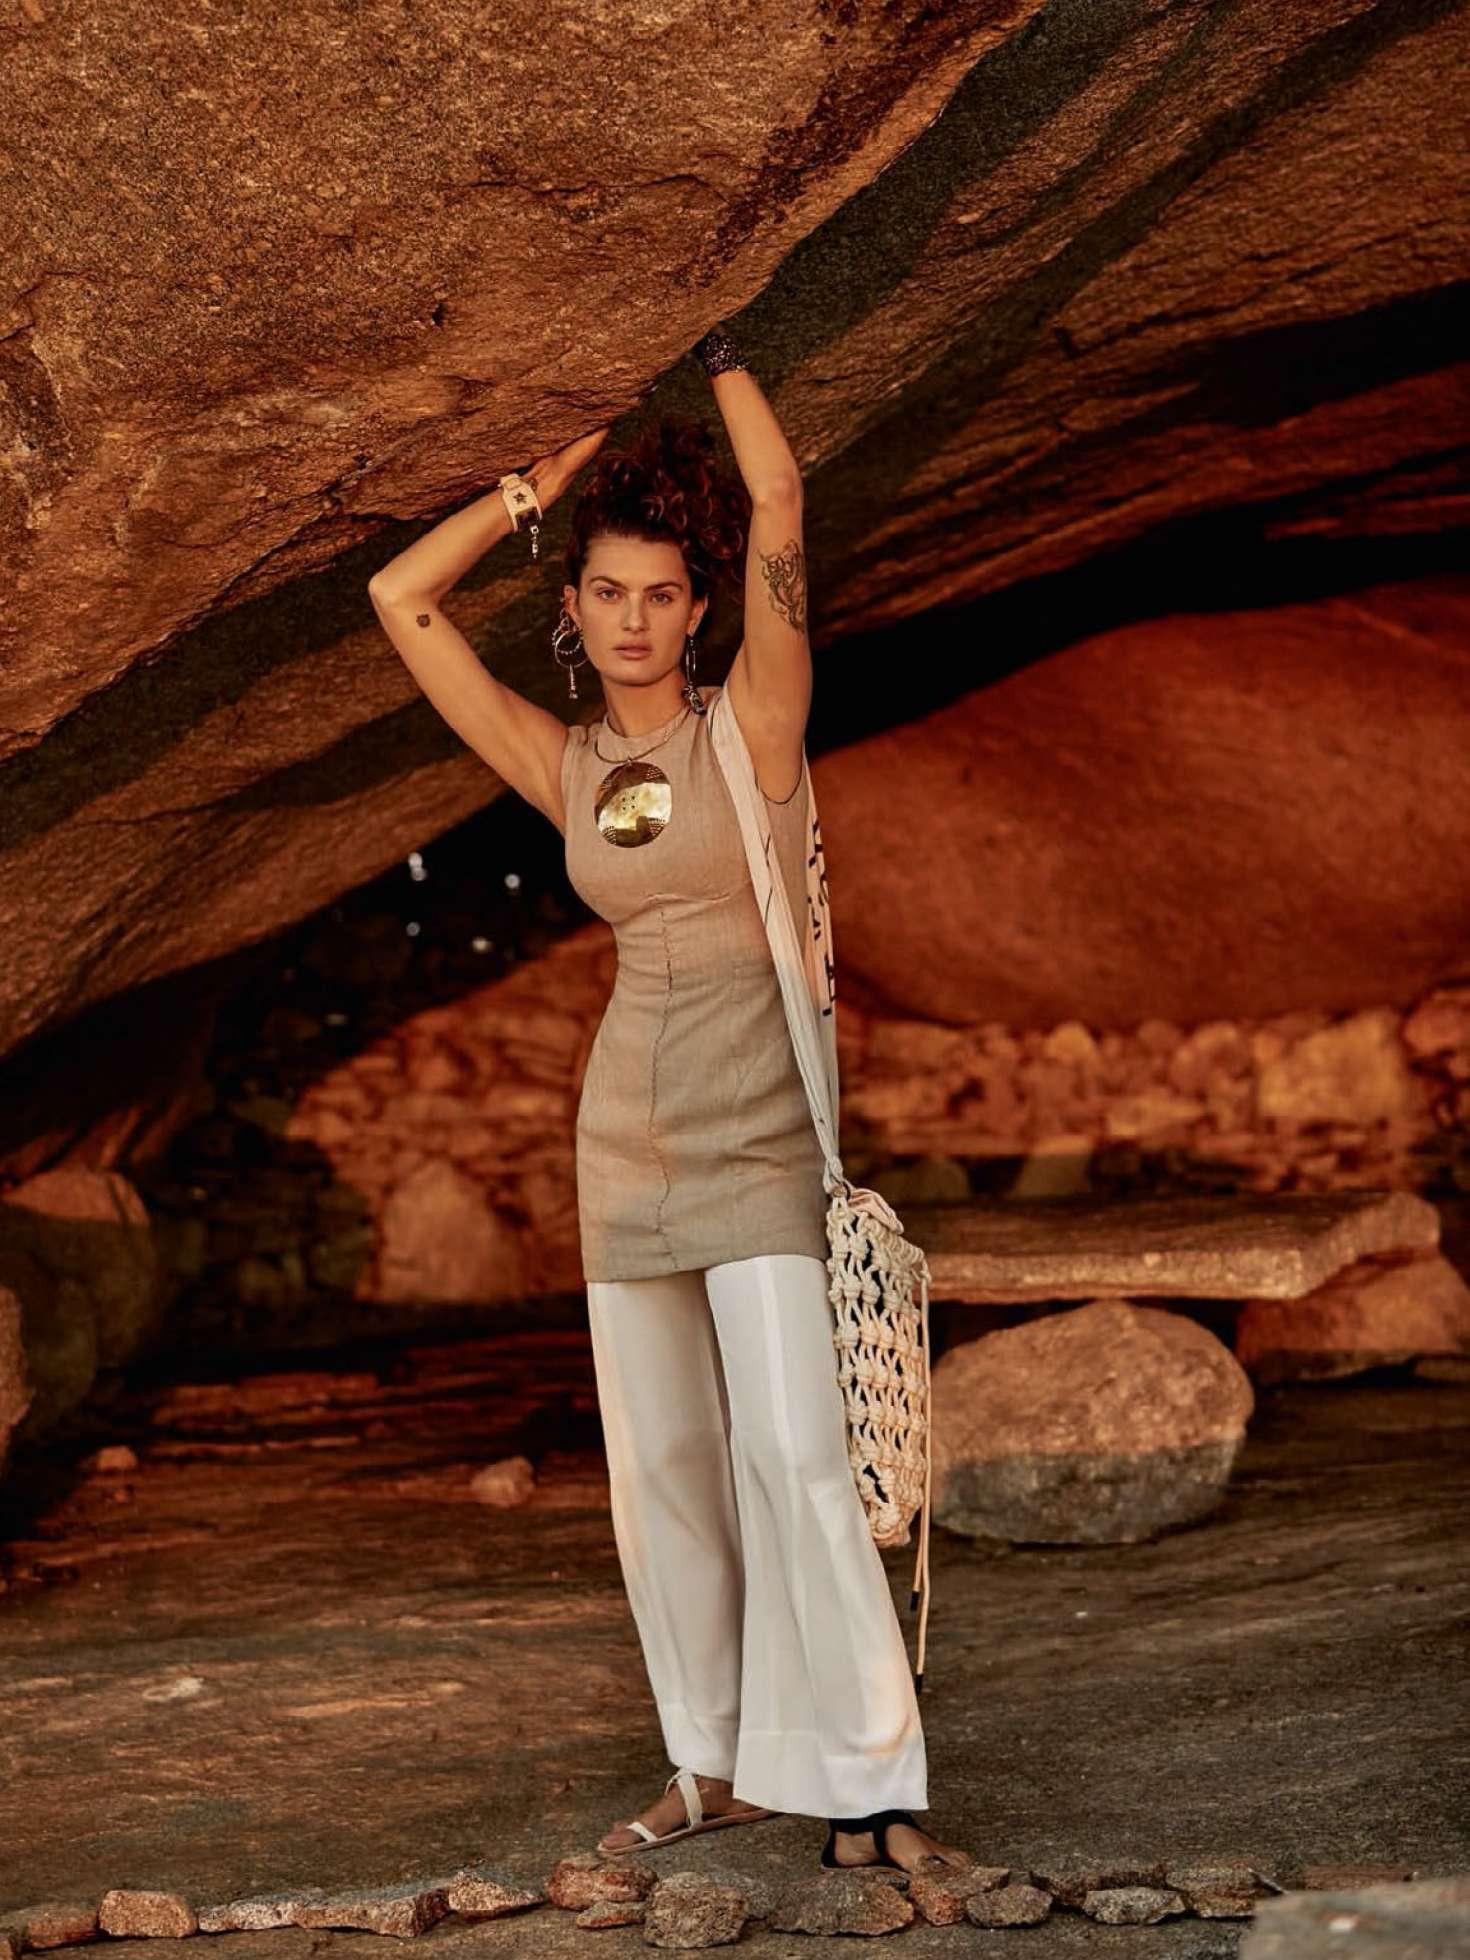 Isabeli Fontana 2017 : Isabeli Fontana: Vogue Brazil 2017 -16